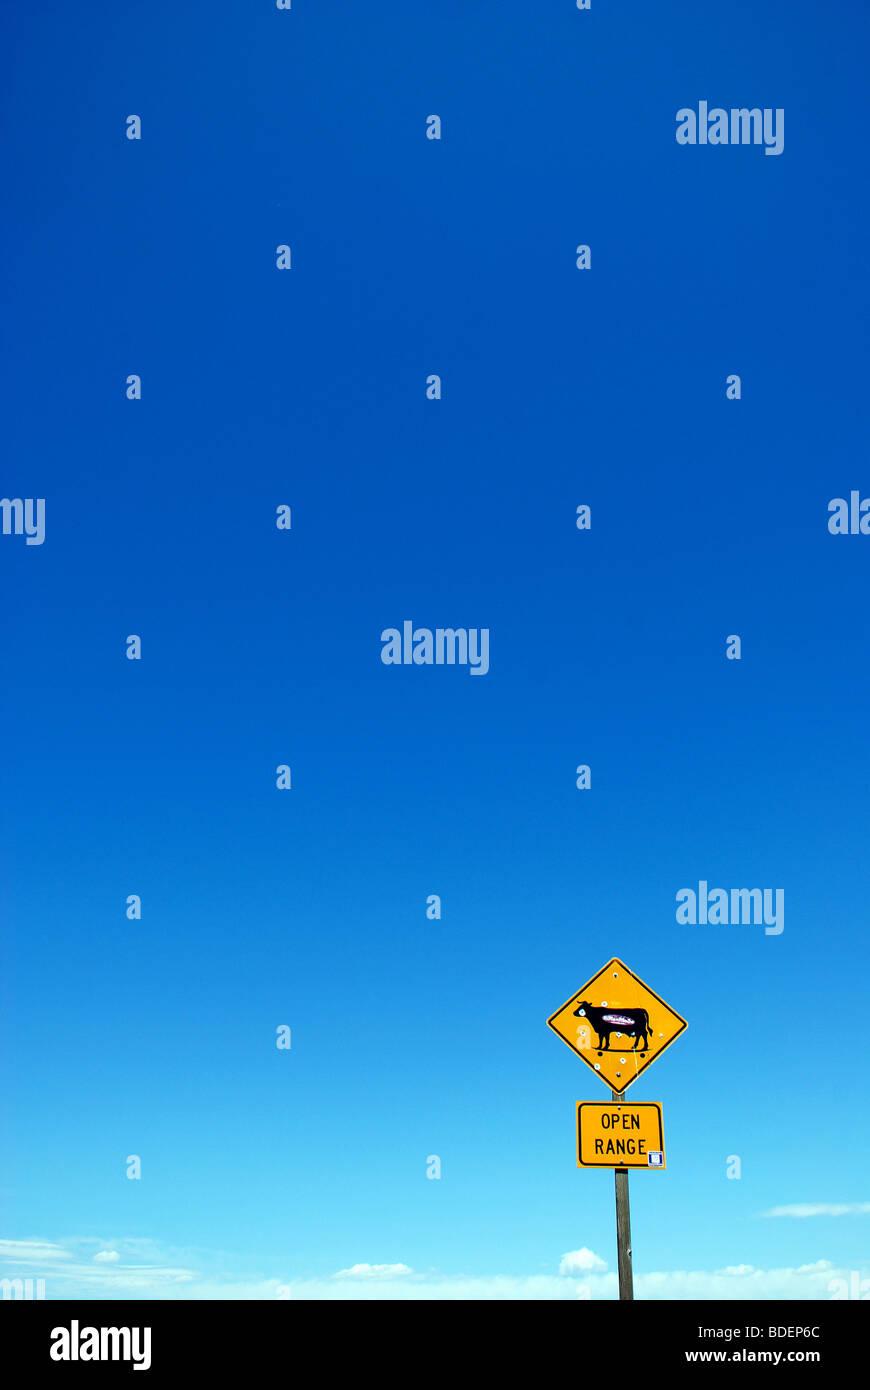 "Amarillo ""open range"", señal de tráfico con agujeros de bala contra el cielo azul claro. Imagen De Stock"